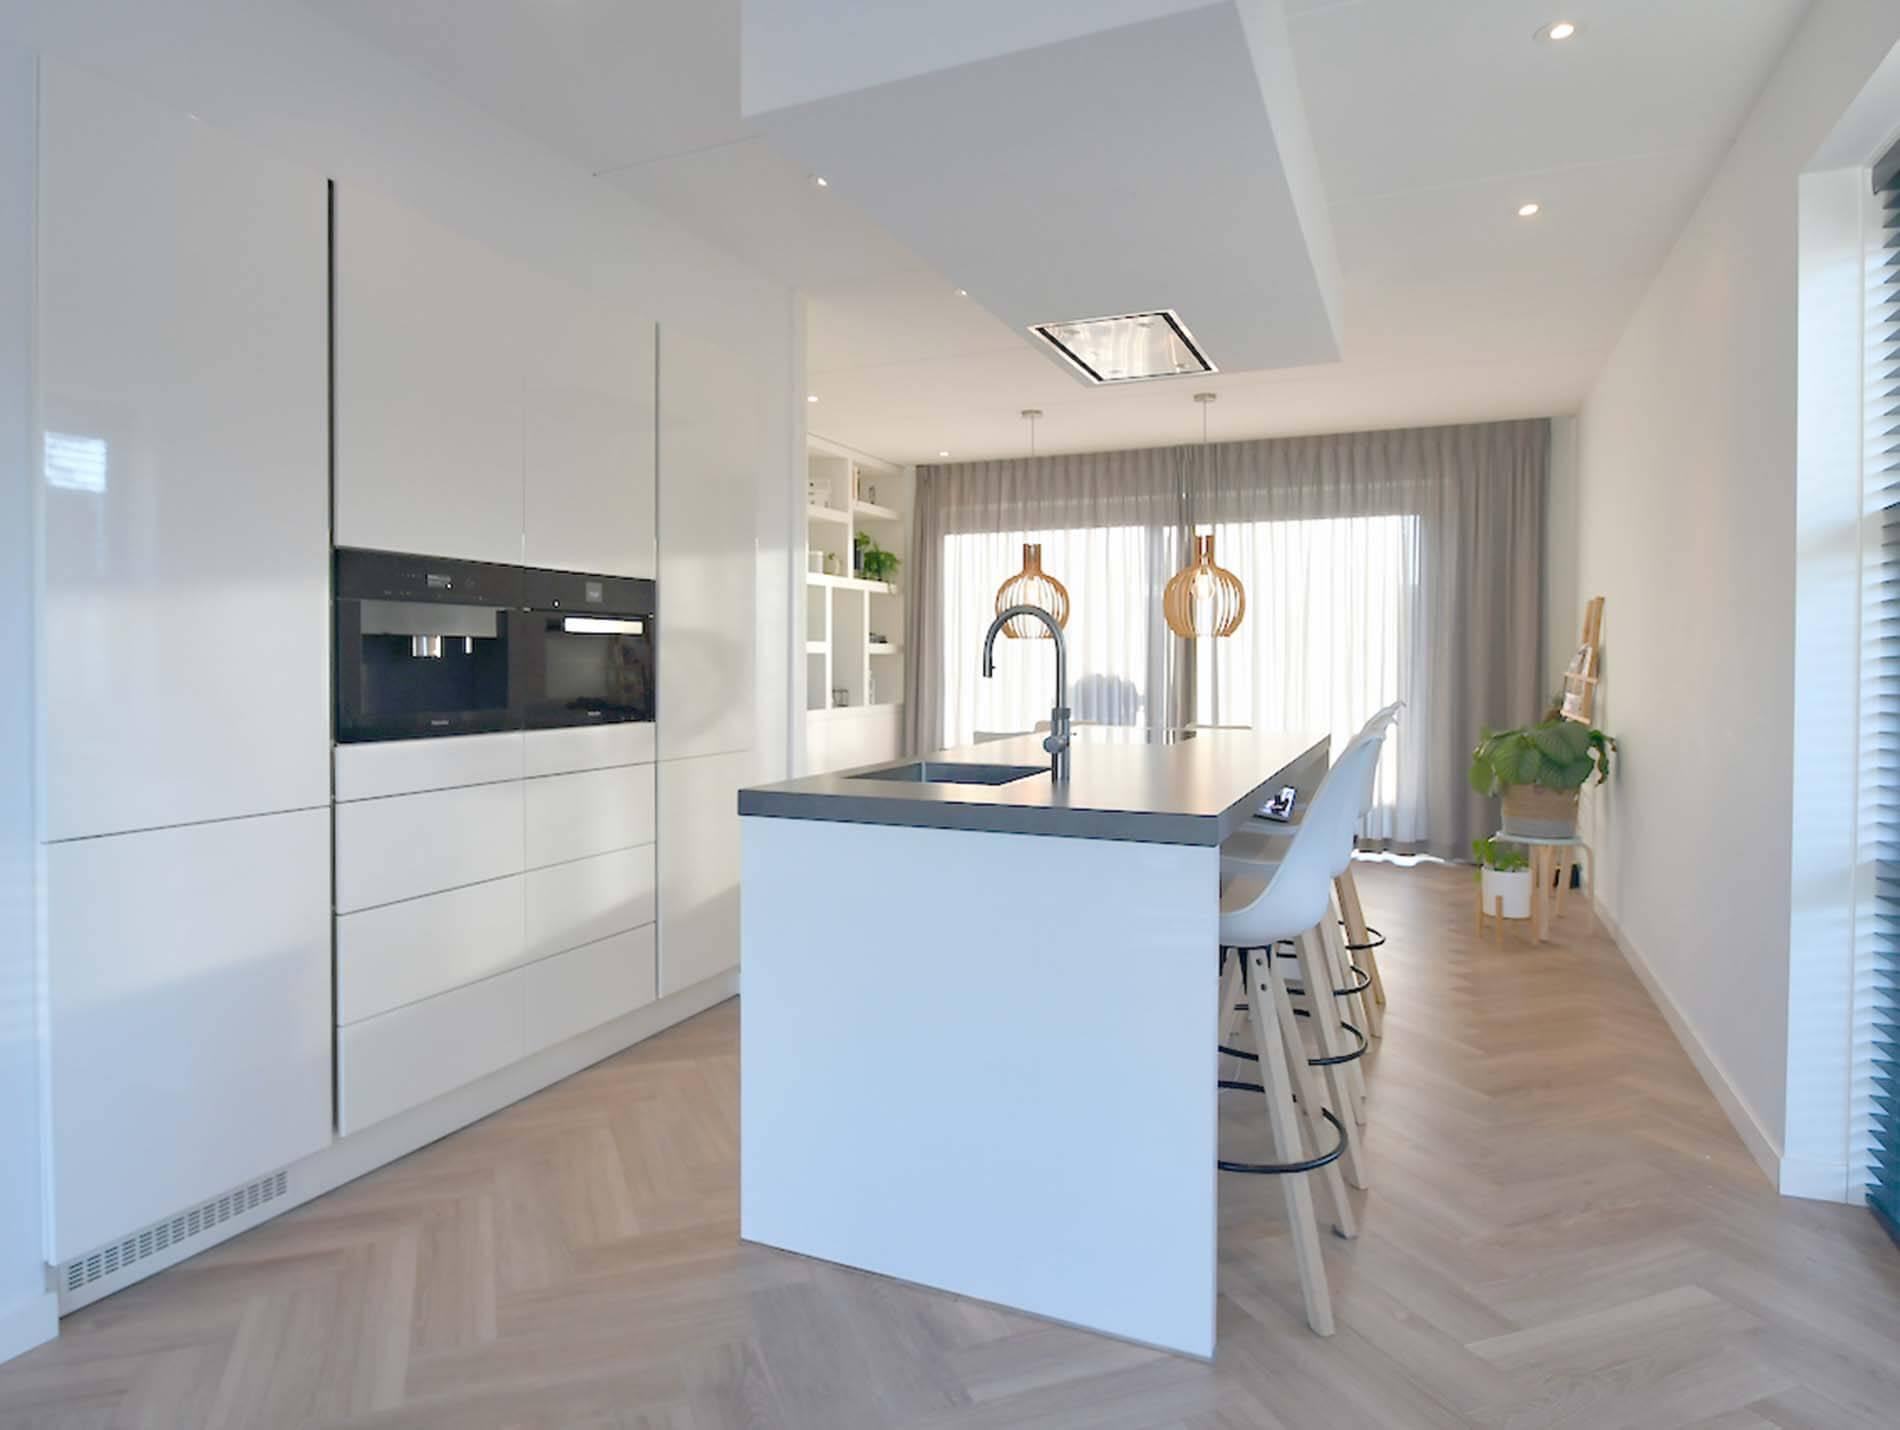 4. Interieur-drachten-nieuwbouw-woning-1900x1430p.jpg